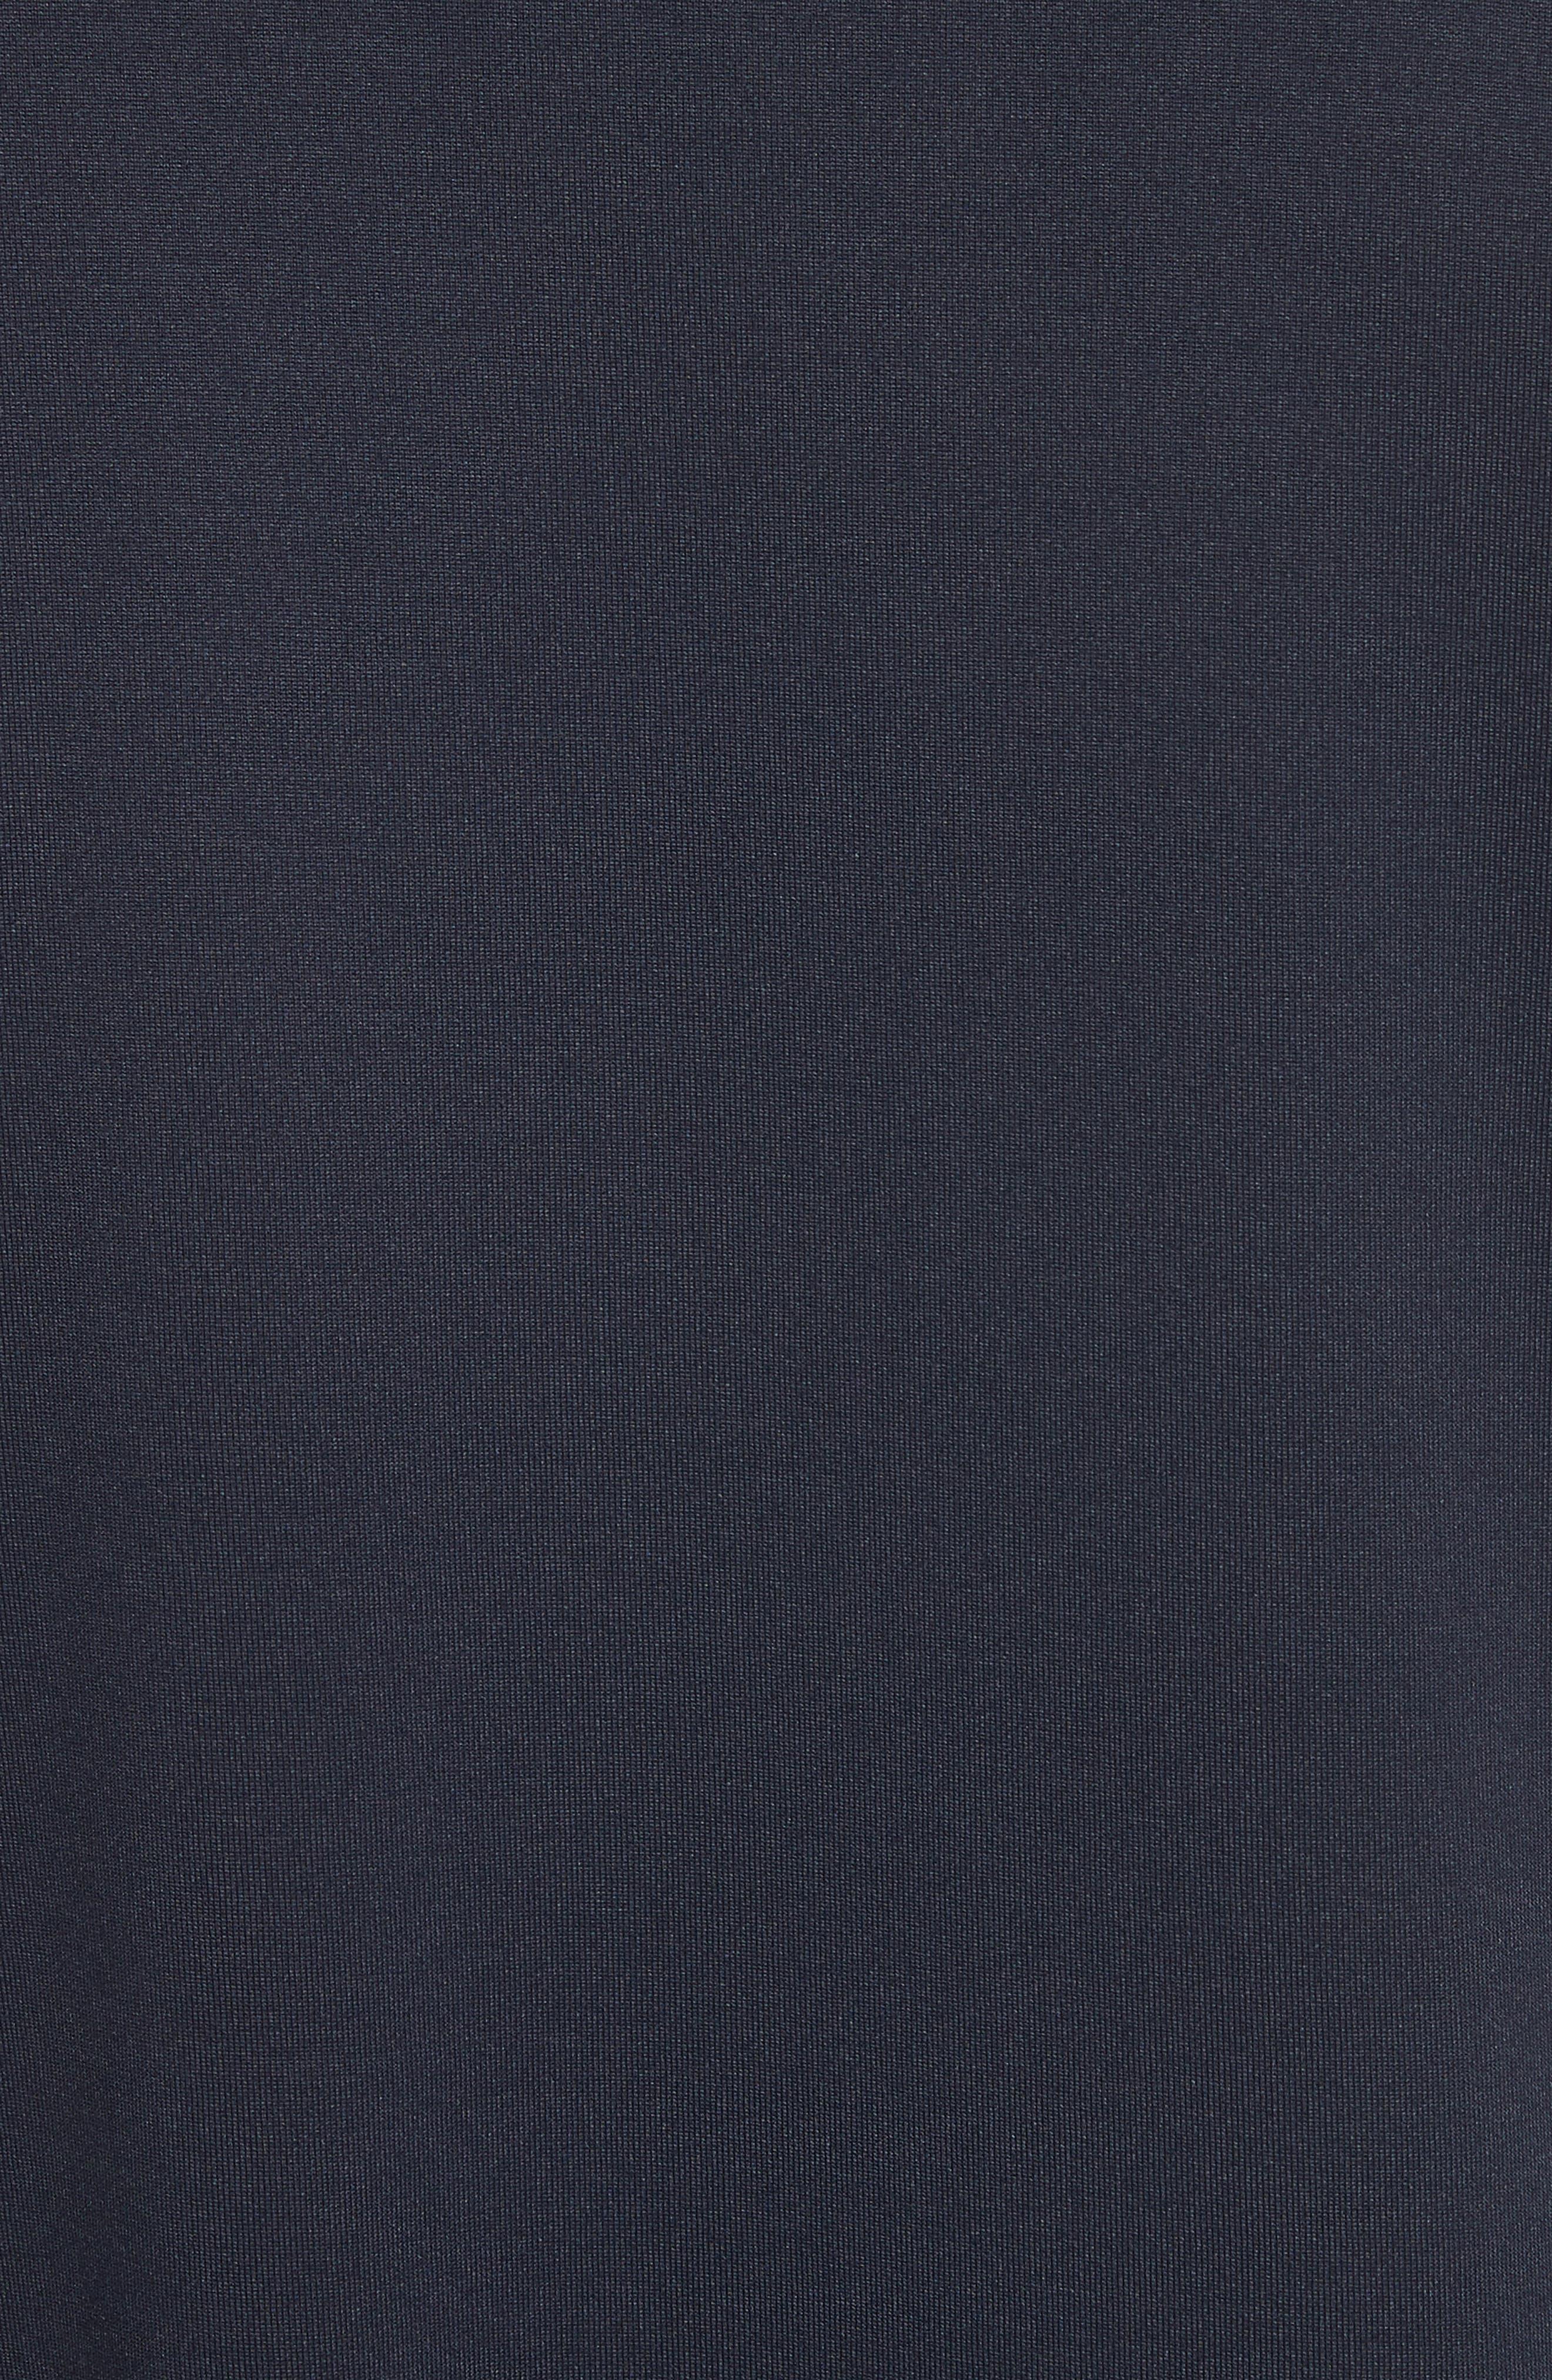 x adidas Tonal Stripe Crewneck T-Shirt,                             Alternate thumbnail 5, color,                             Navy